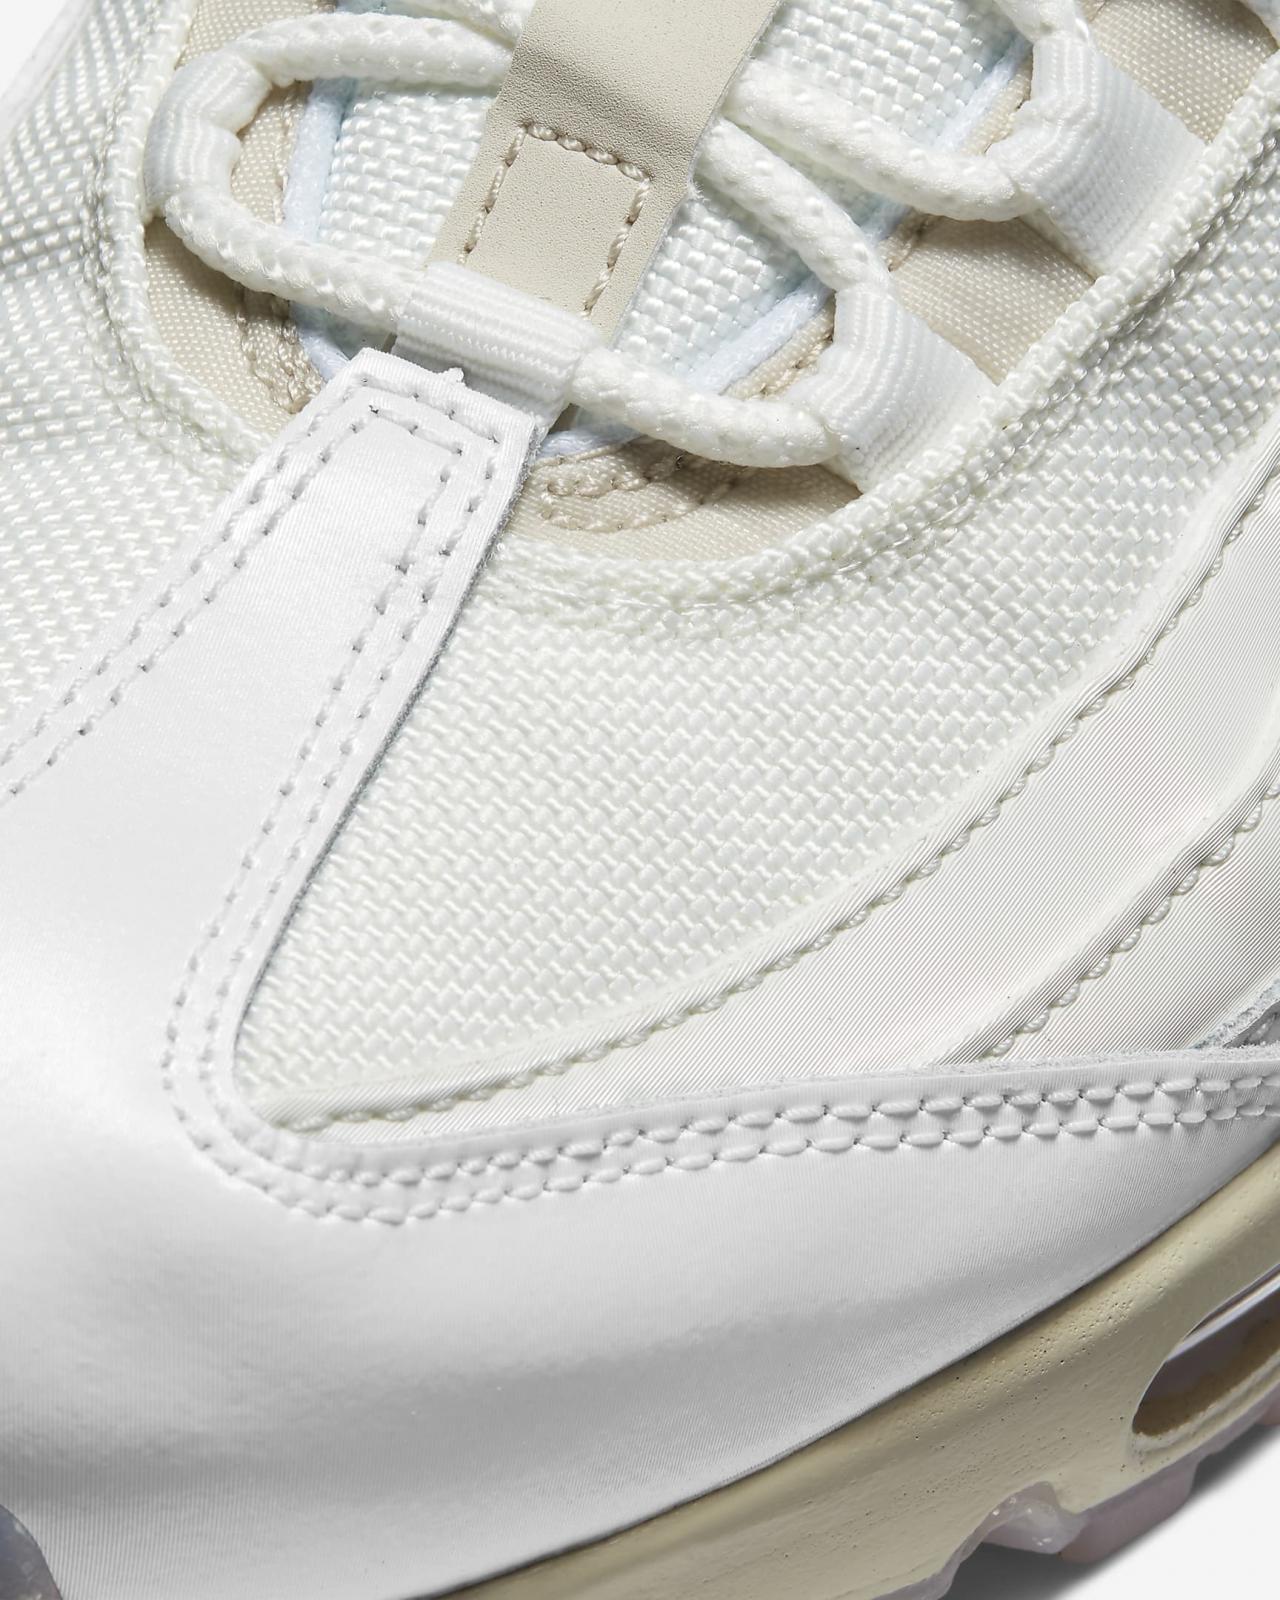 Nike Sportswear推出山峰白/浅红木褐/红古铜色WMNS Air Max 95